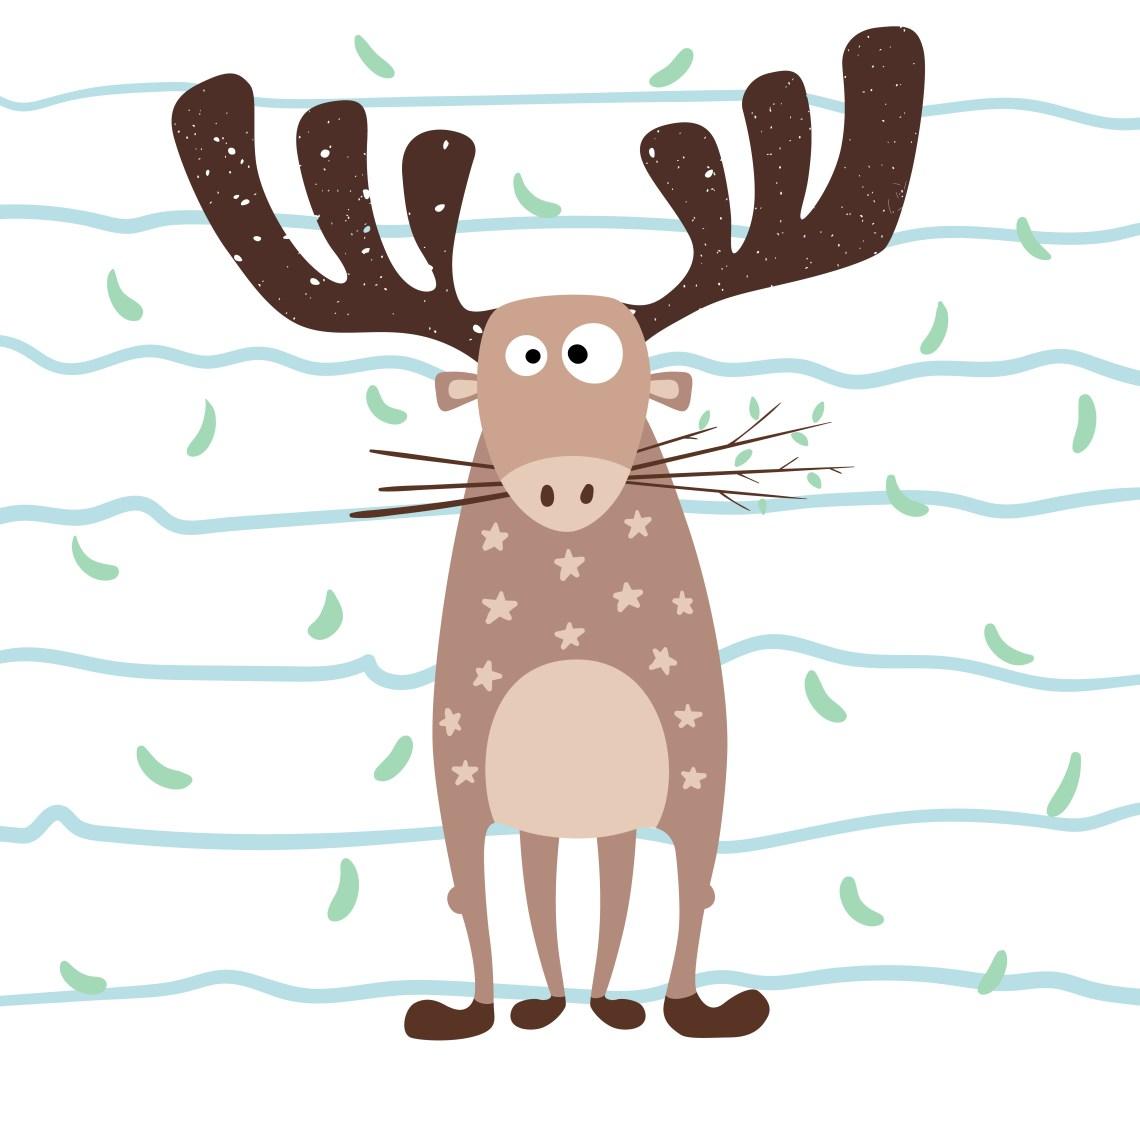 Download Teddy deer love - cartoon funny illustration. - Download ...